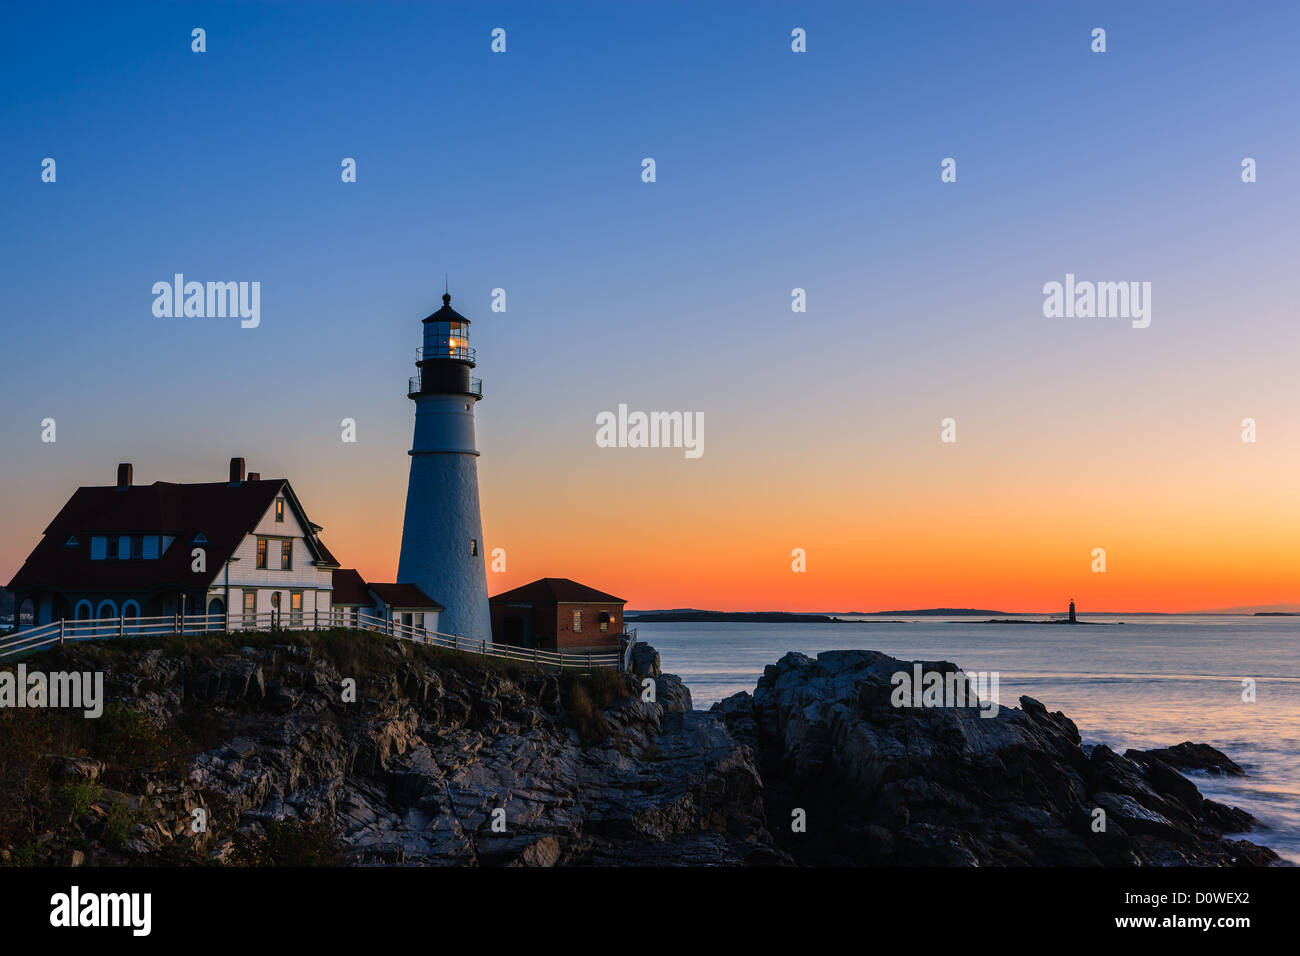 Portland Head Light is a historic lighthouse in Cape Elizabeth, Maine - Stock Image